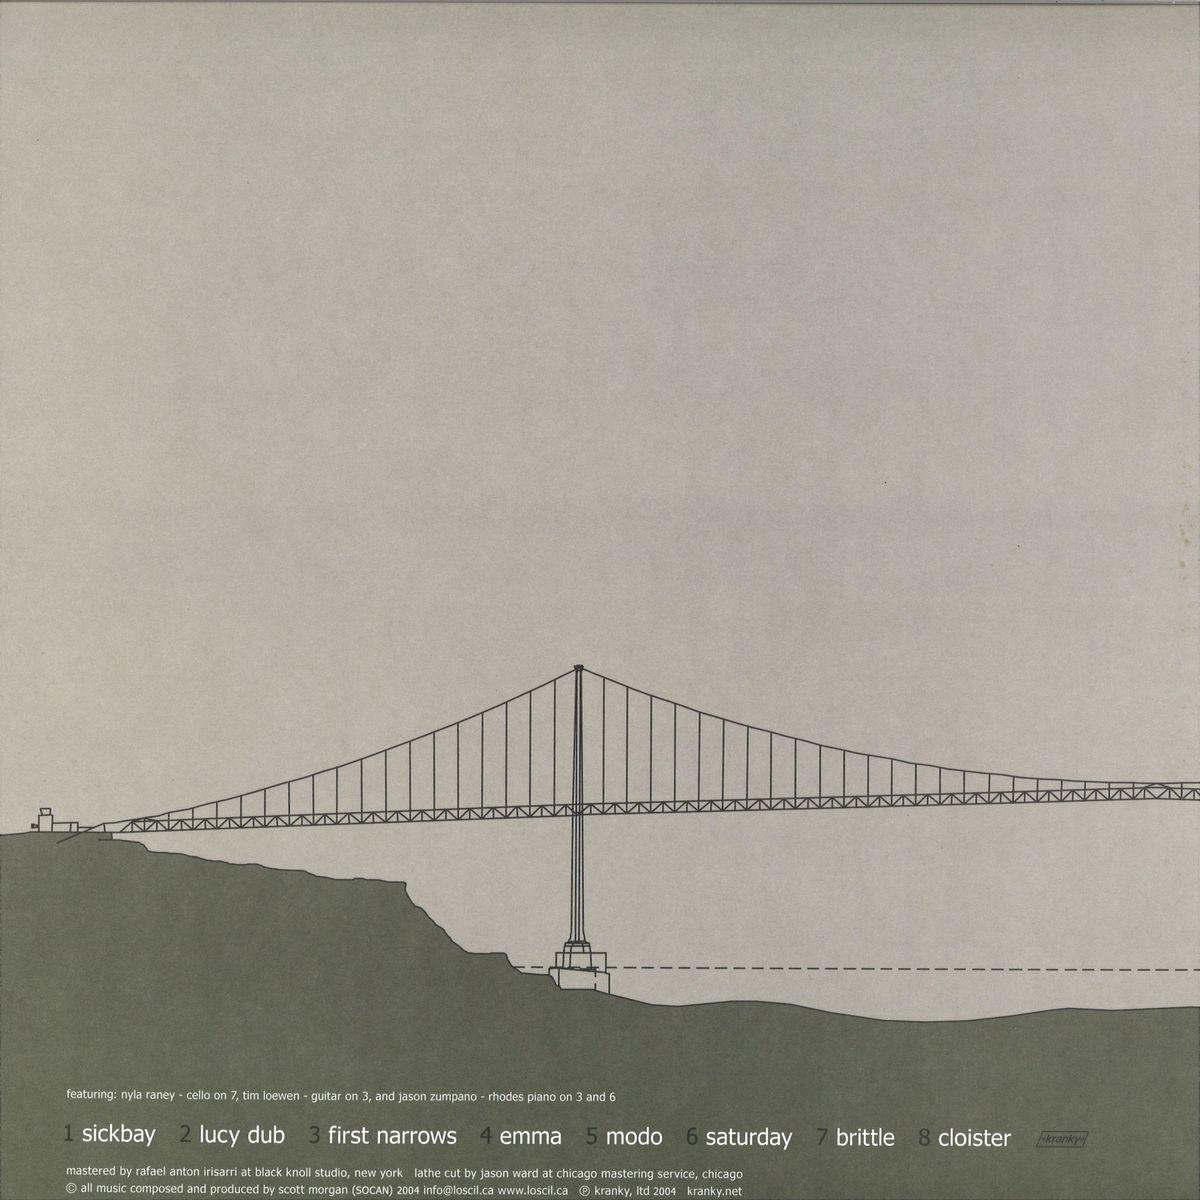 Kranky Records Narrows Bridge Again Name The Parts Of In This Diagram